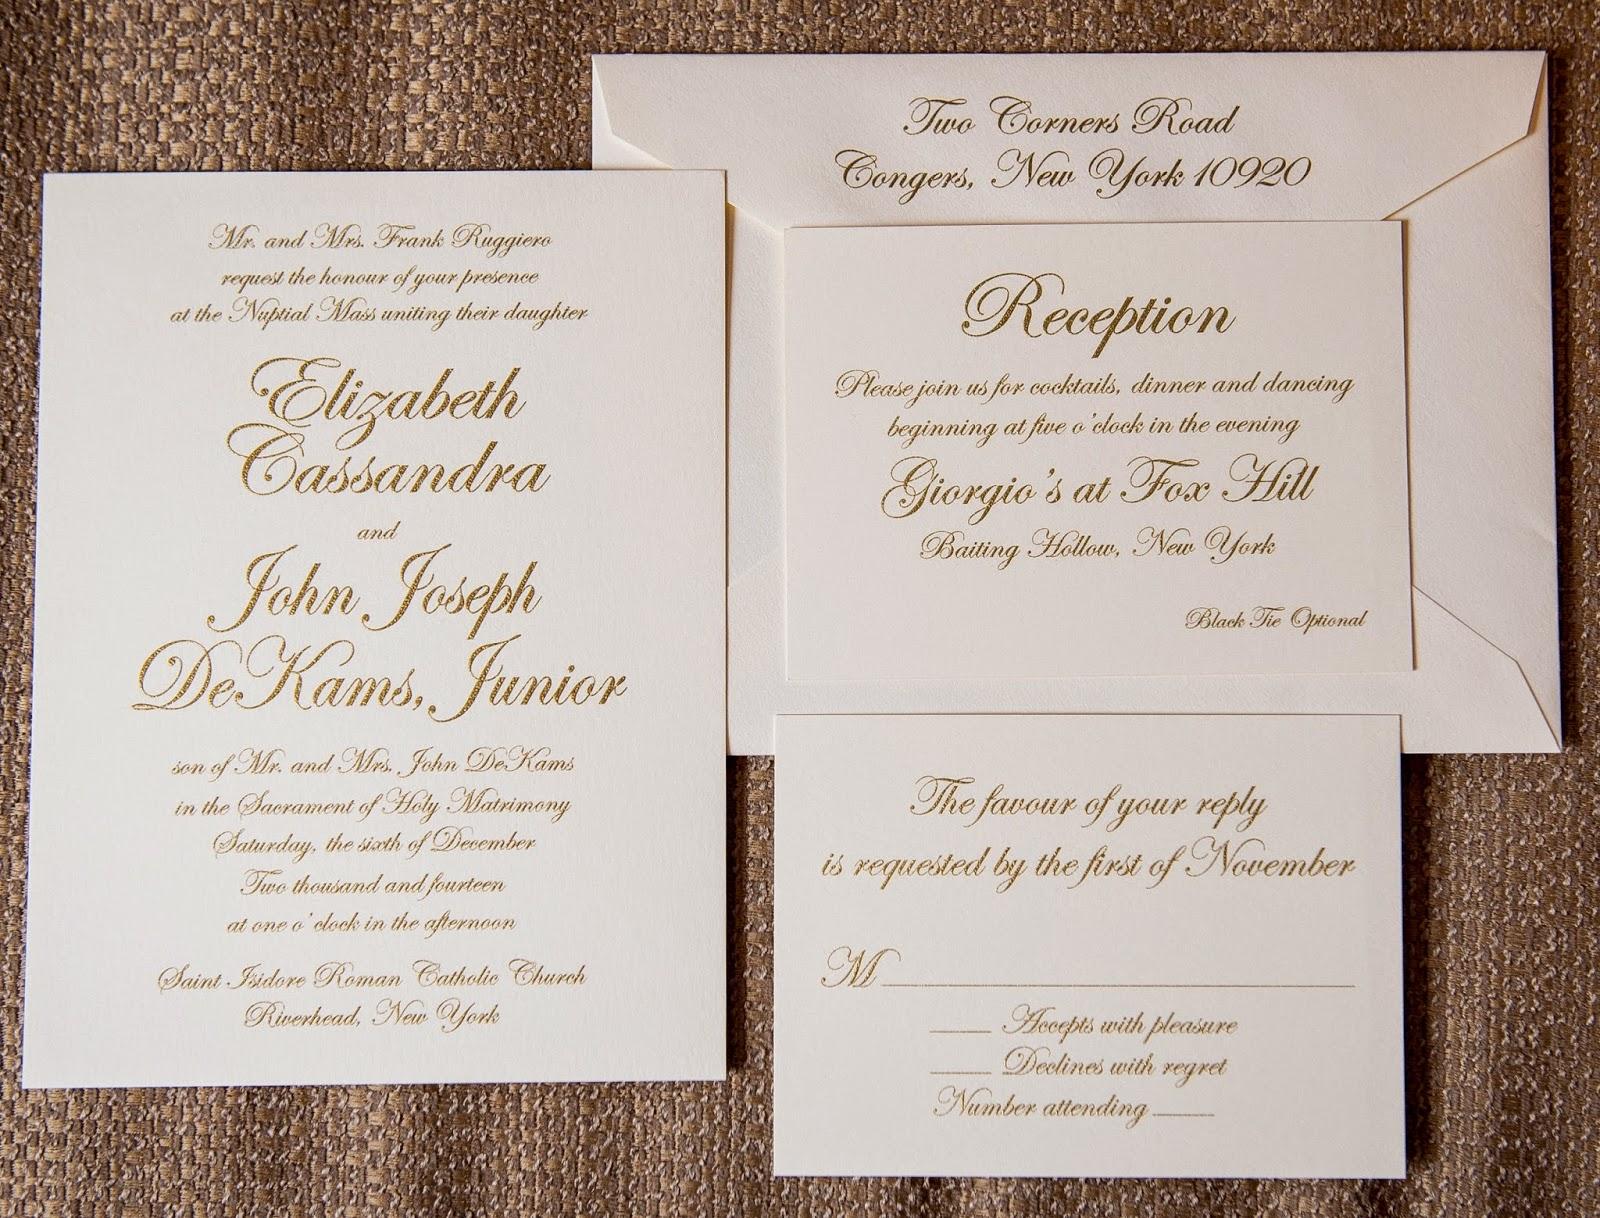 William Arthur Blog Real Weddings Elizabeth and John